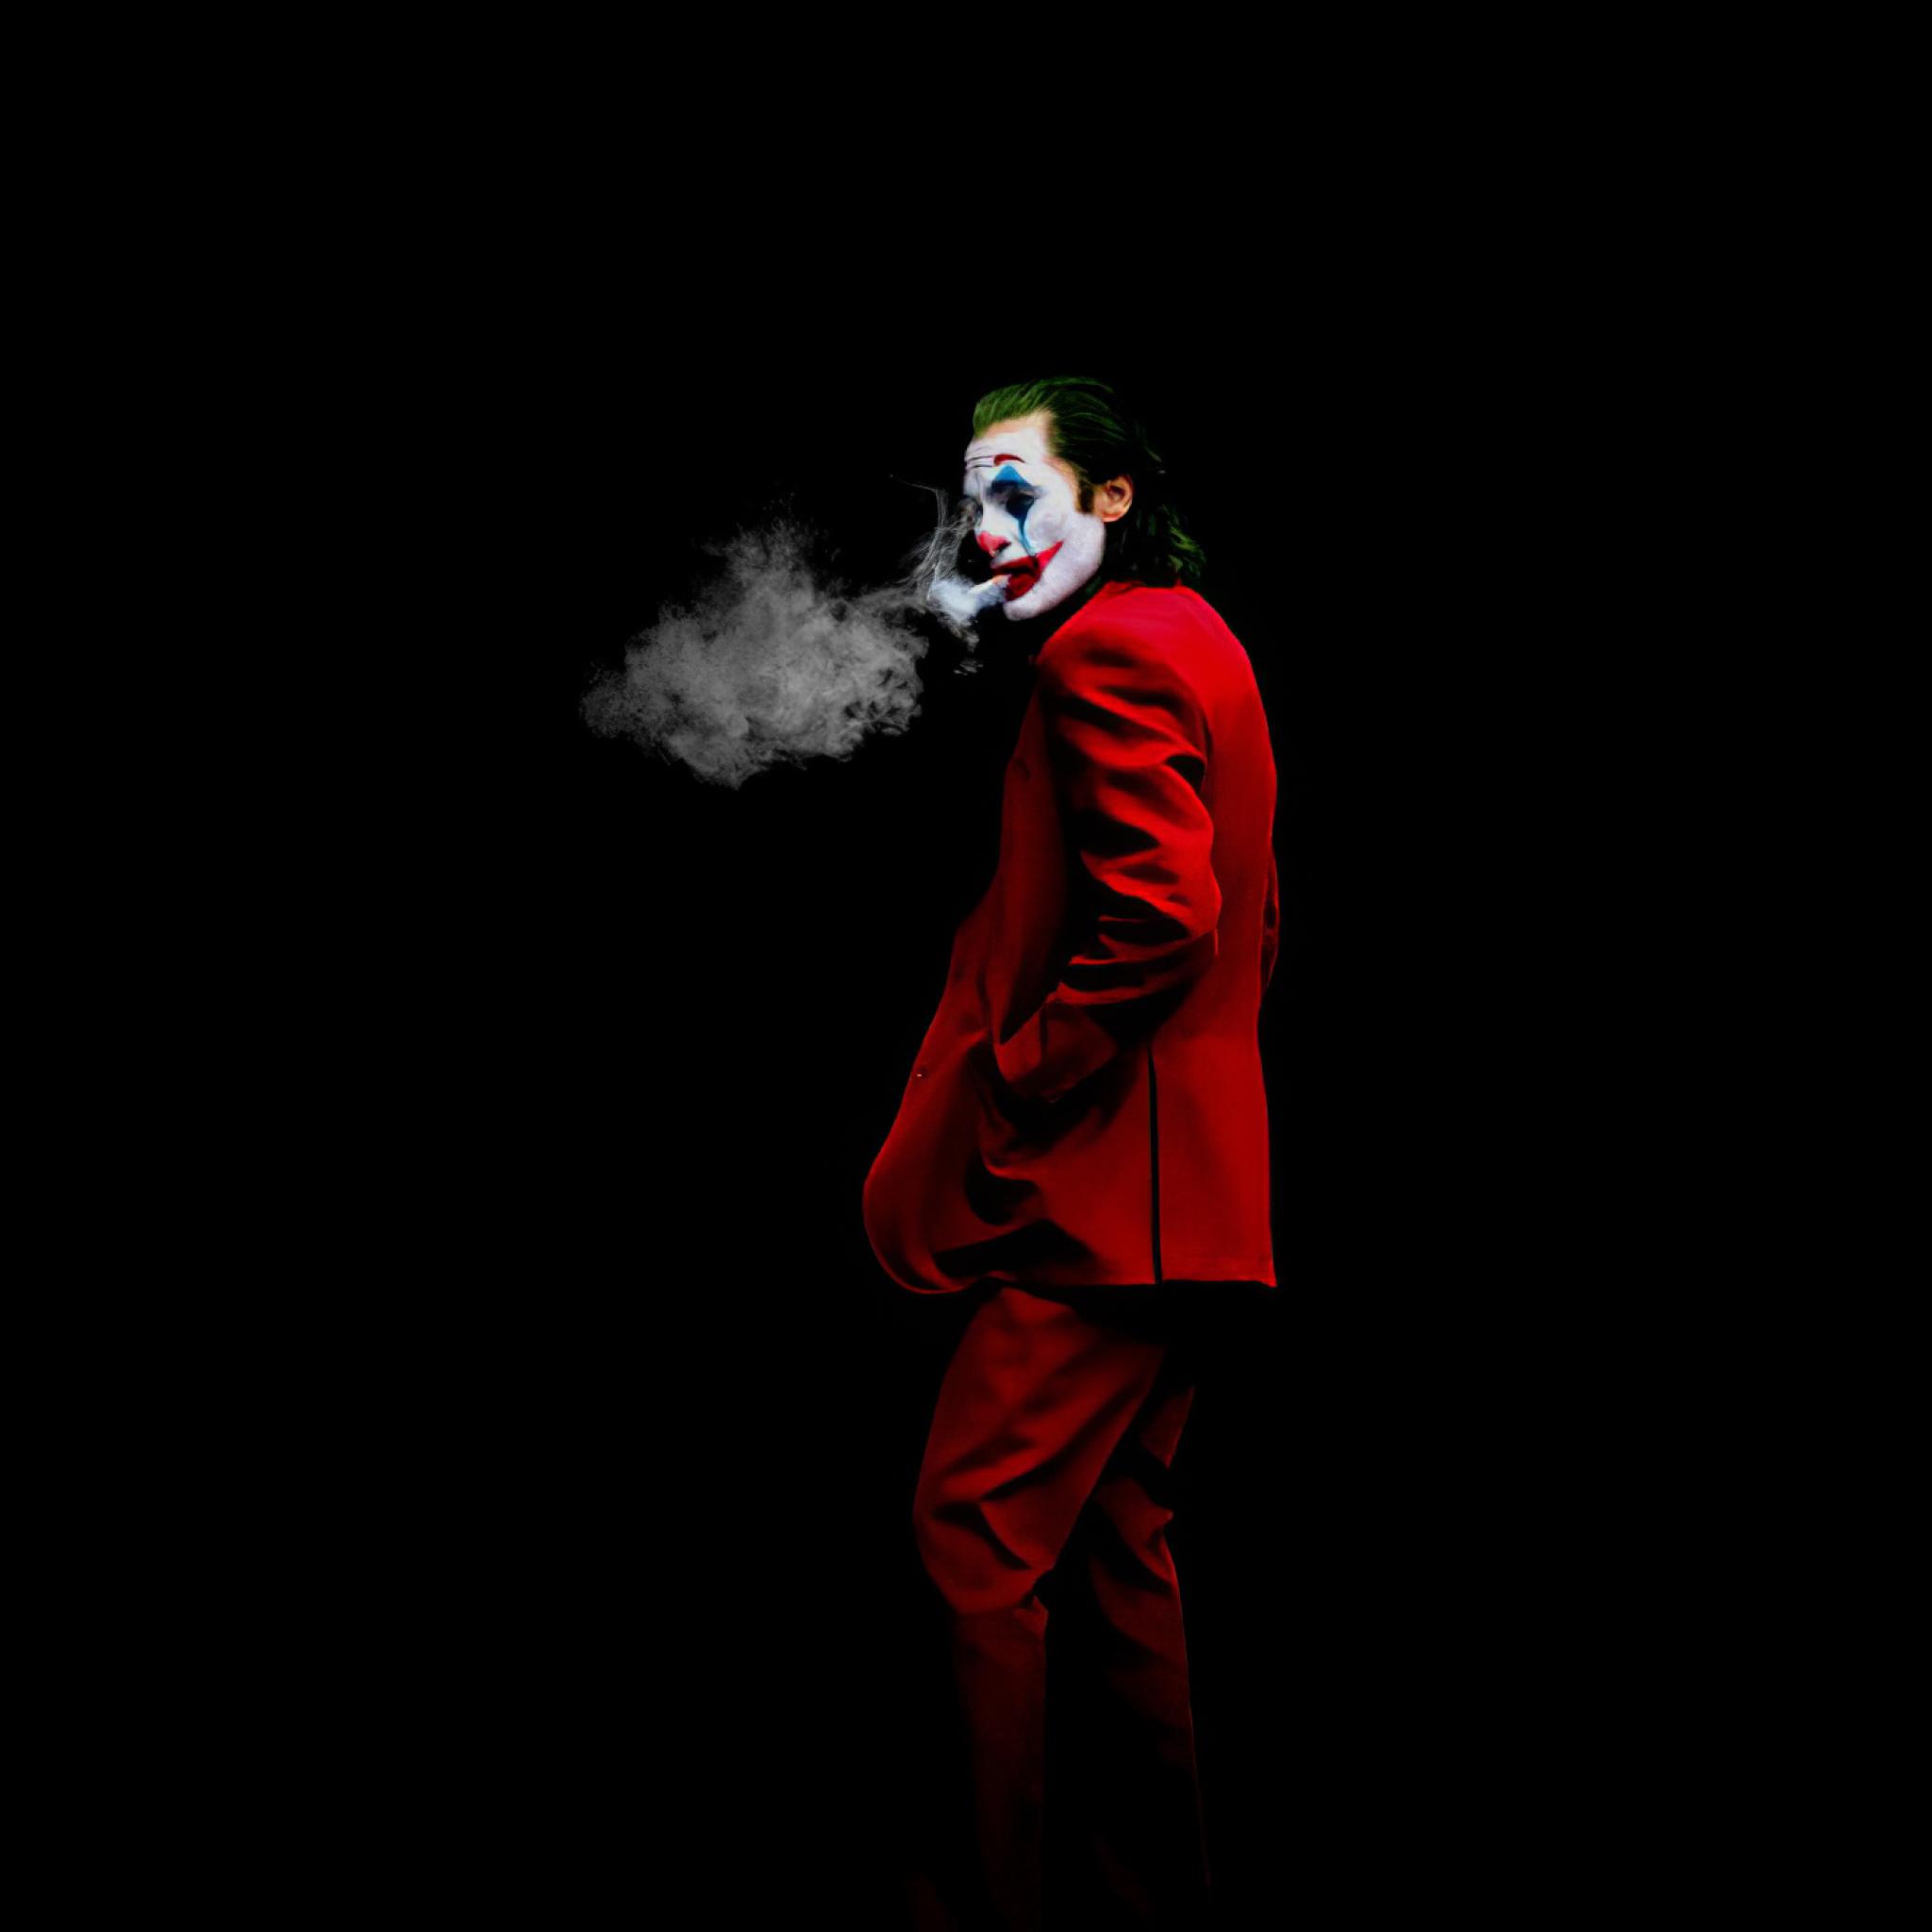 New Joker 2020 Art Wallpaper in 2048x2048 Resolution